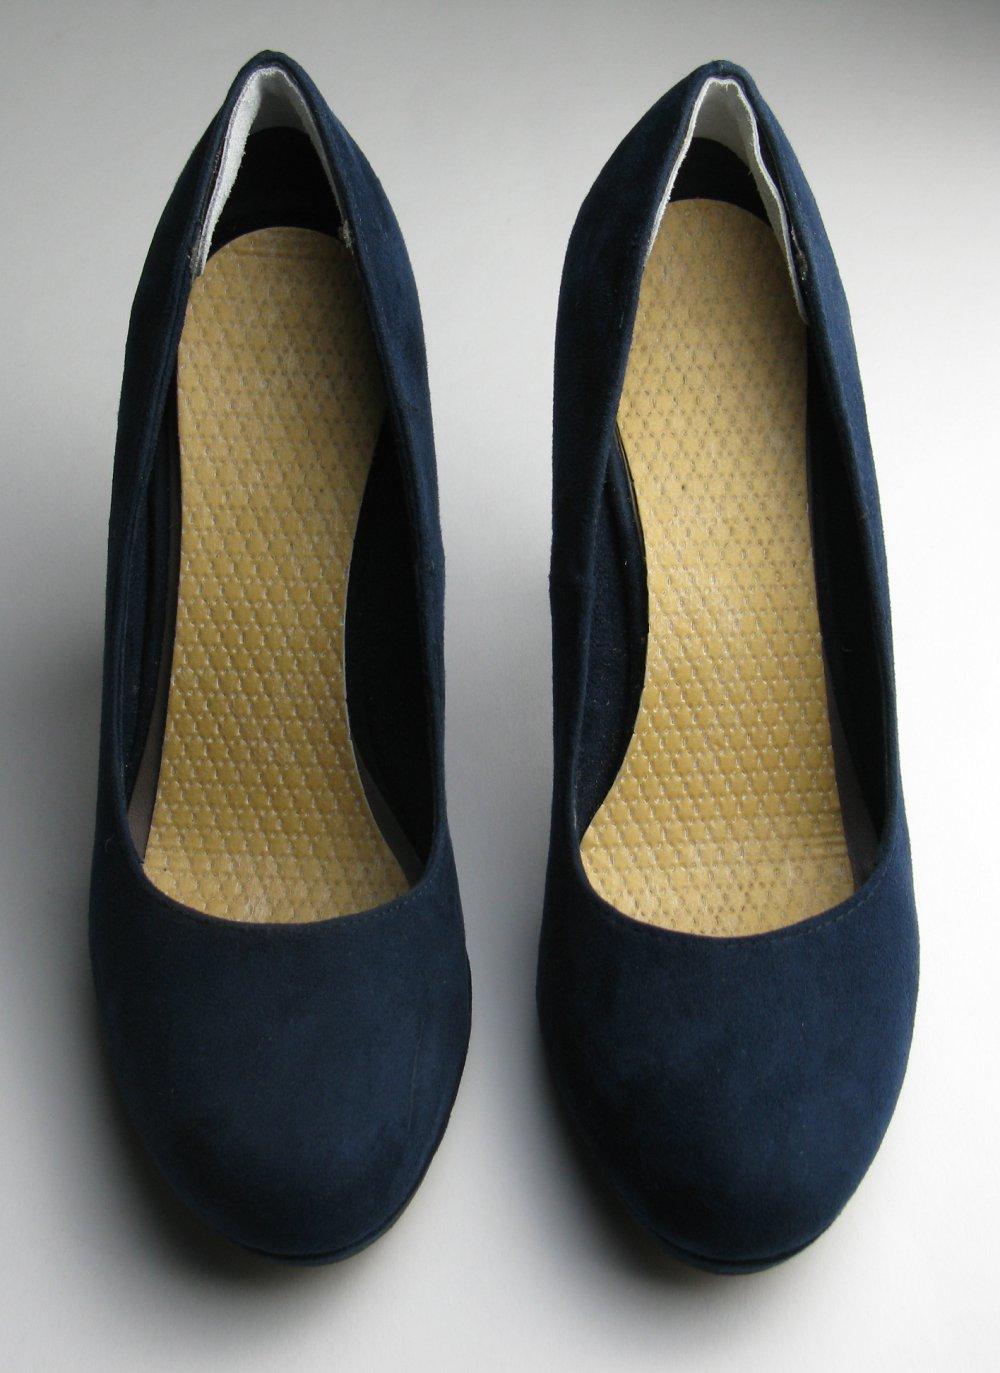 Damen Pumps, Schuhe, blau, elegant, modern, Tamaris, Gr. 39